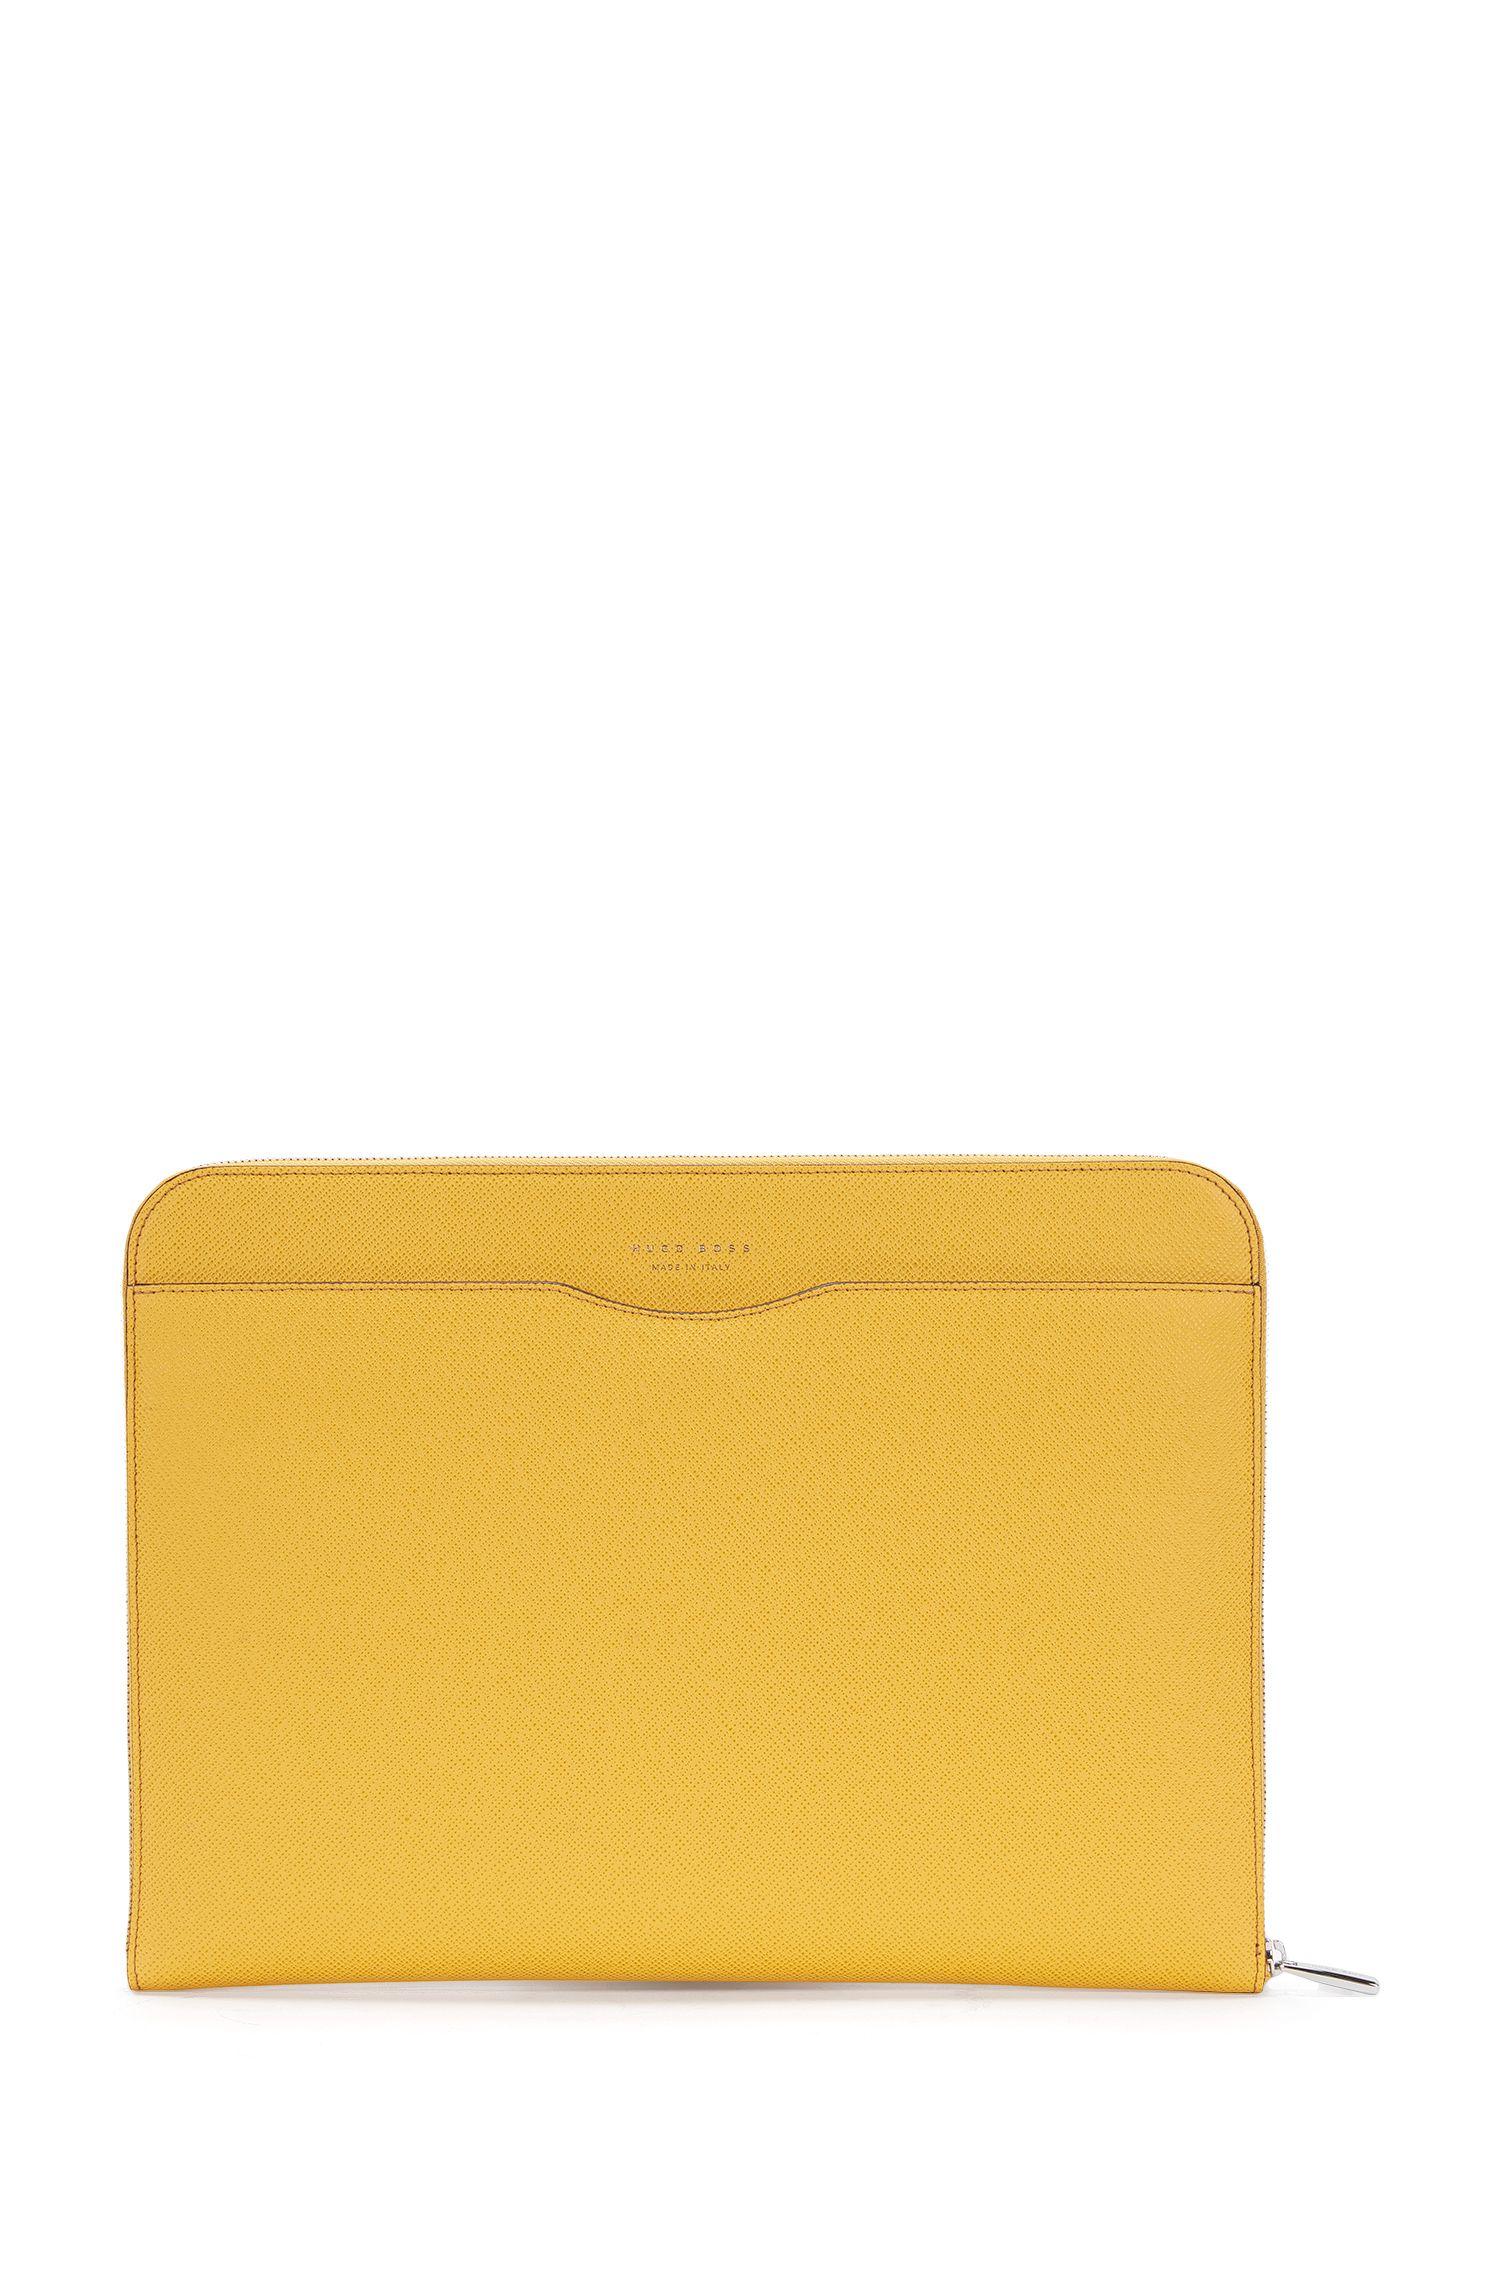 Porte-document BOSS de la collection Signature en cuir palmellato